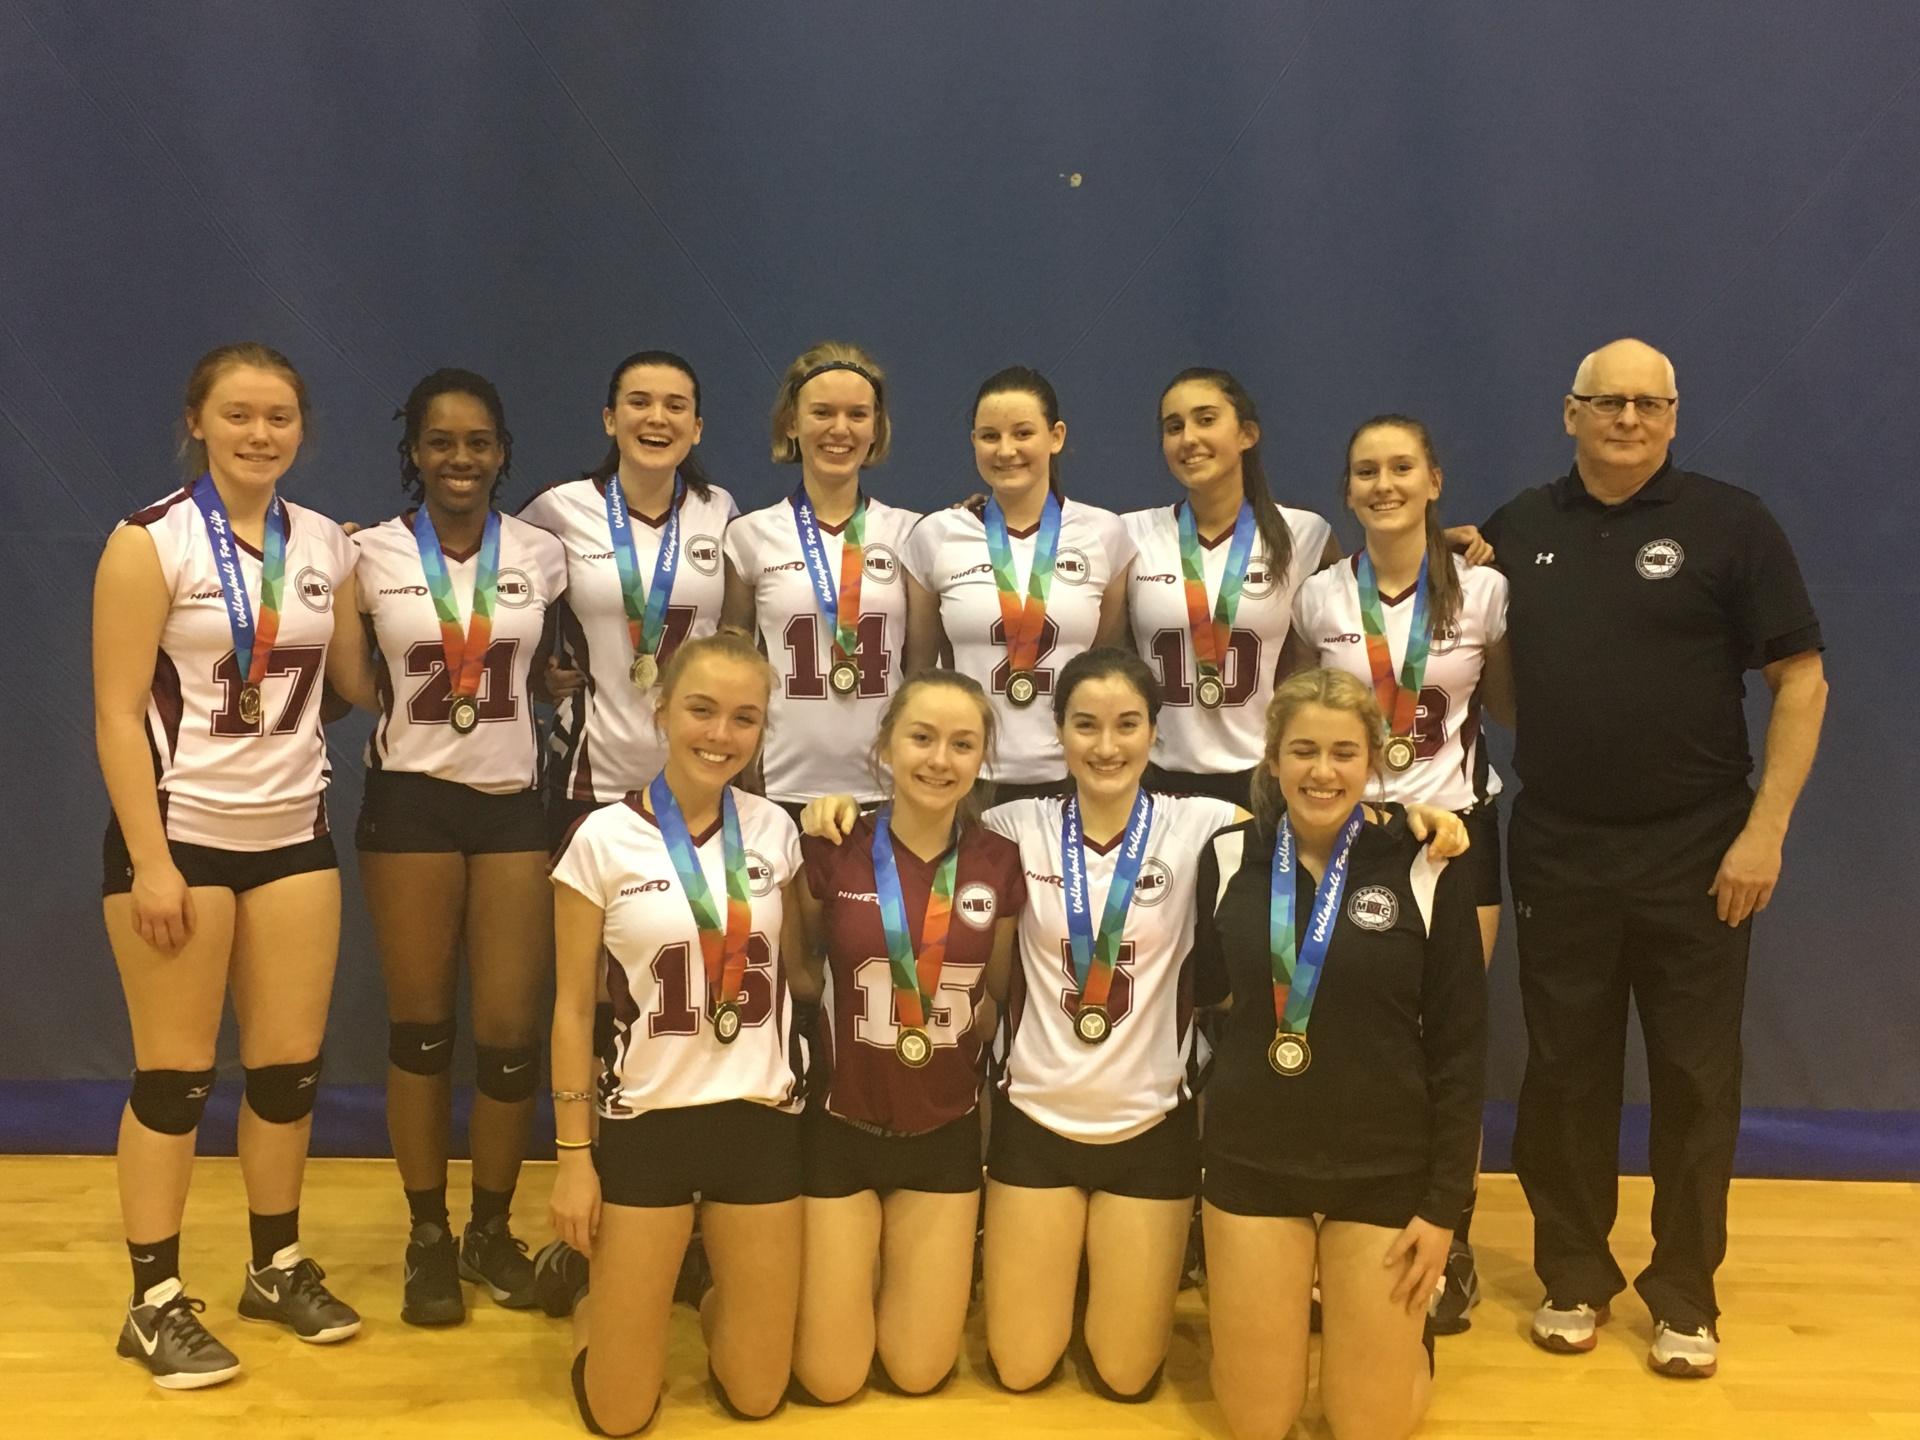 17U Gold Medallists at 18U McGregor Cup - Trillium